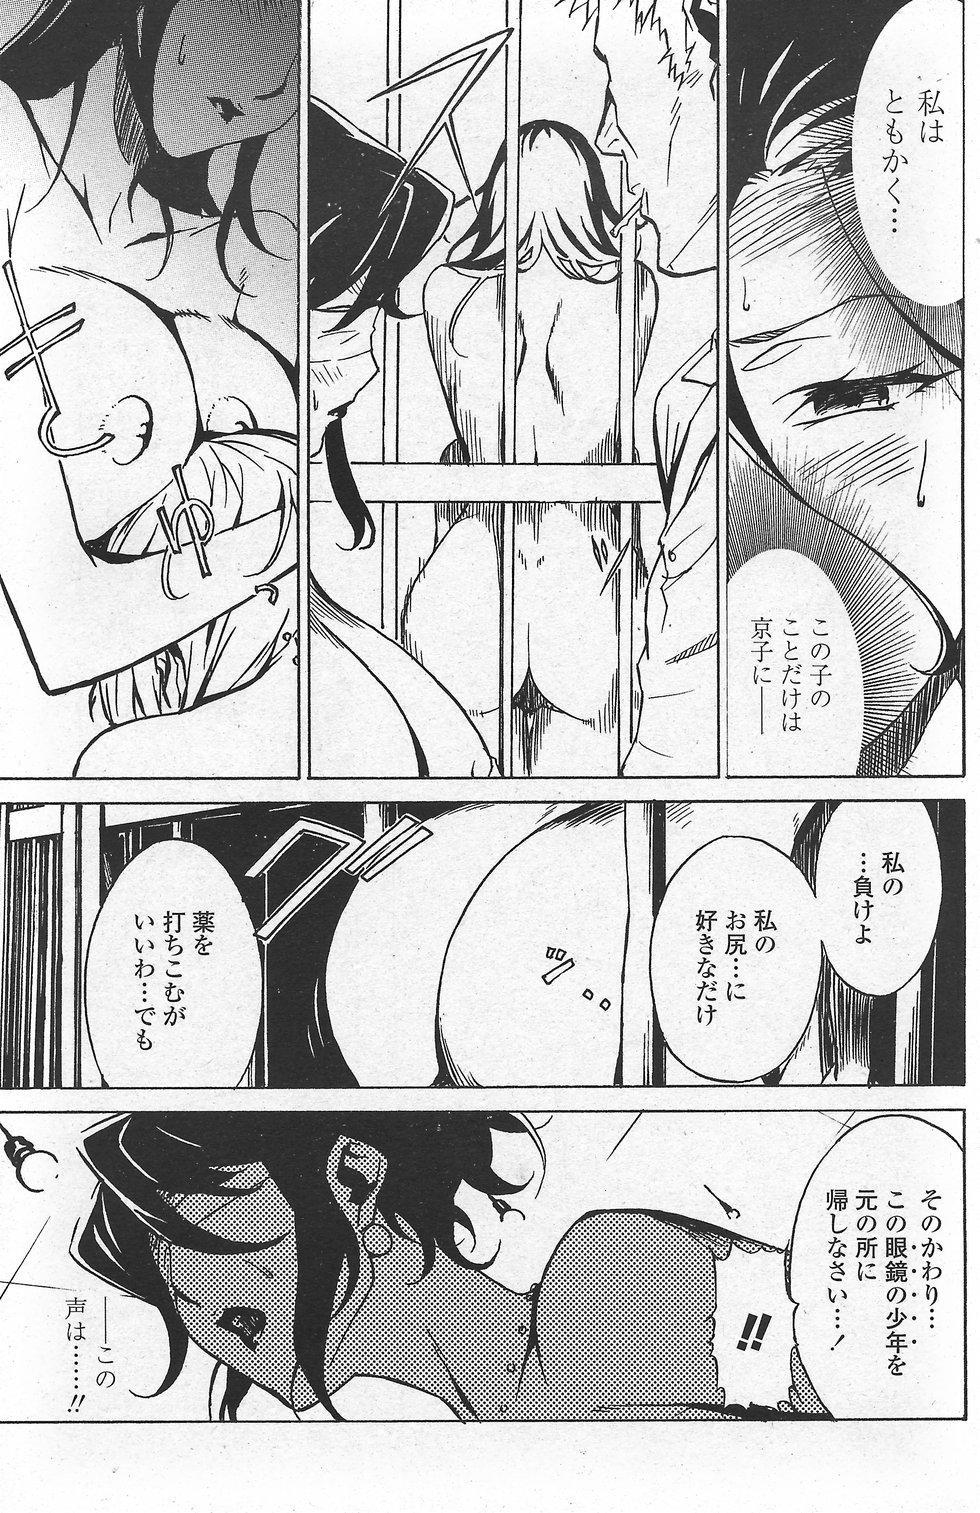 COMIC Penguin Club Sanzokuban 2007-10 Vol. 225 120